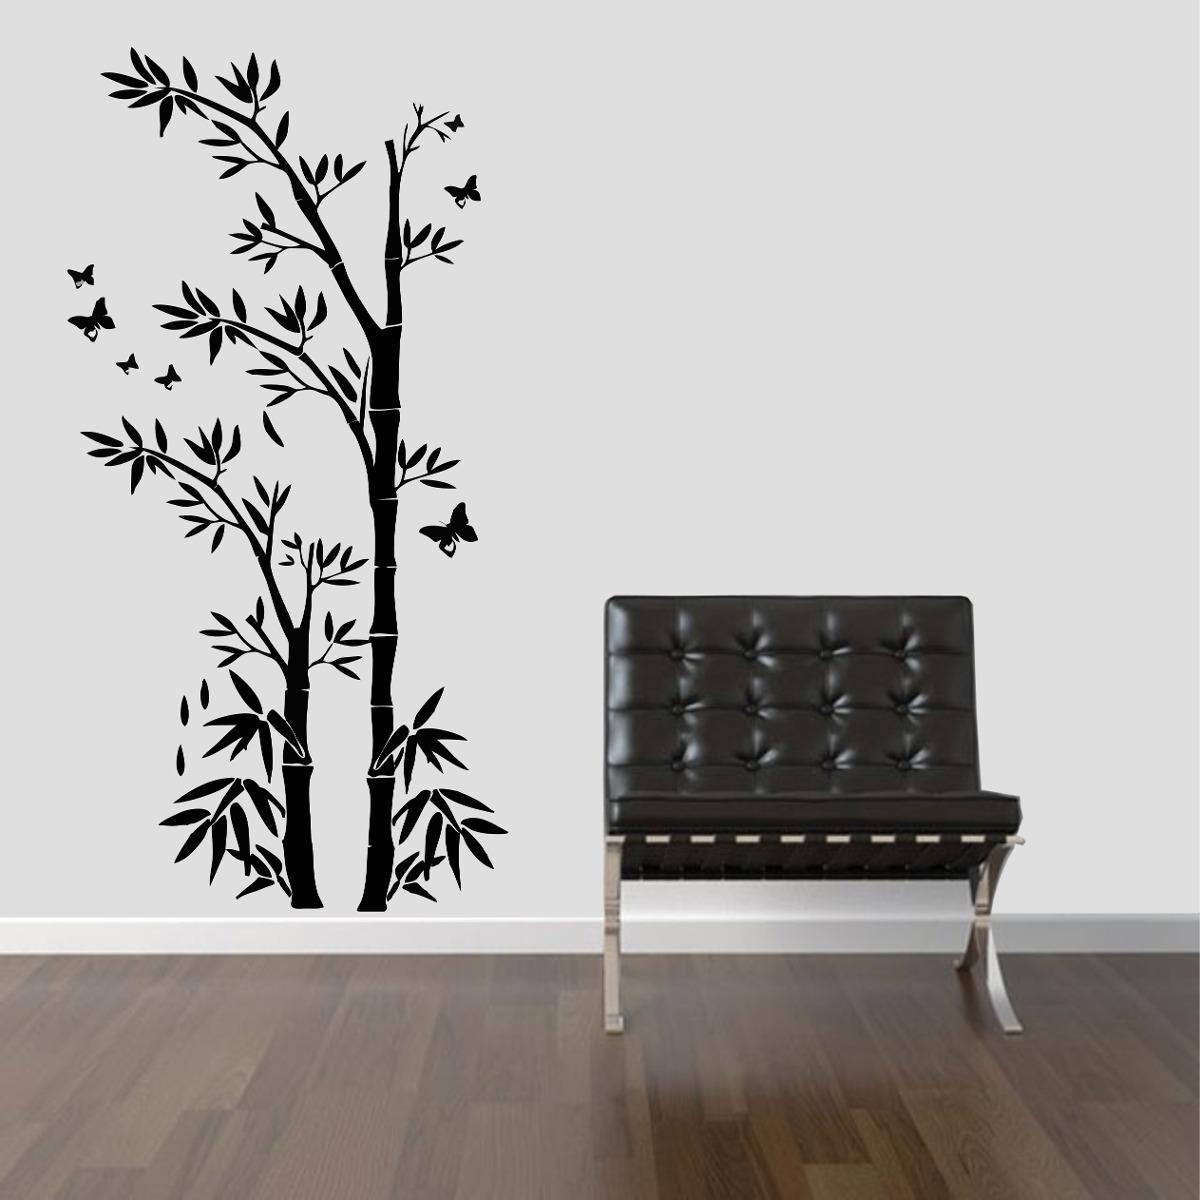 Adesivo De Parede Onde Encontrar ~ Adesivo Decorativo Parede Floral Bambu Galhos Borboleta